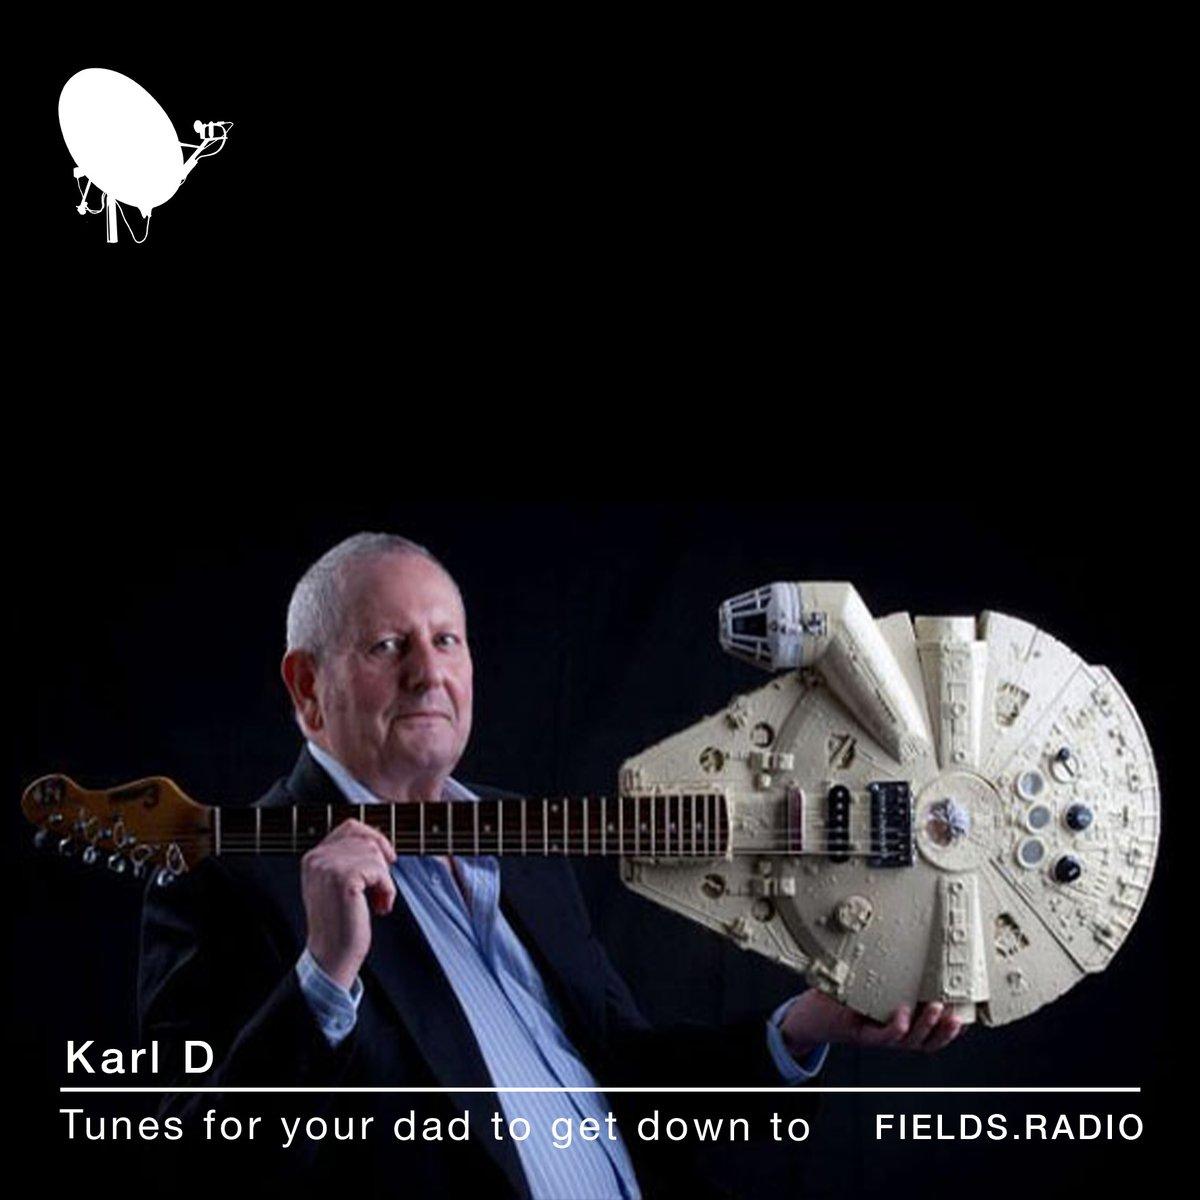 RT @SharkRadioNet: RT @FieldsRadio: Your guide to AOR music is here. Thank you Karl D (@arsihoo) . . . . . #fields #lfr #mixcloud #progressiverock #Rock #music #radio #london #vinyl #AOR #Prog-Rock #boogie #dj #soul #disco #funk #guitar https://t.co/rHihhF1KT1